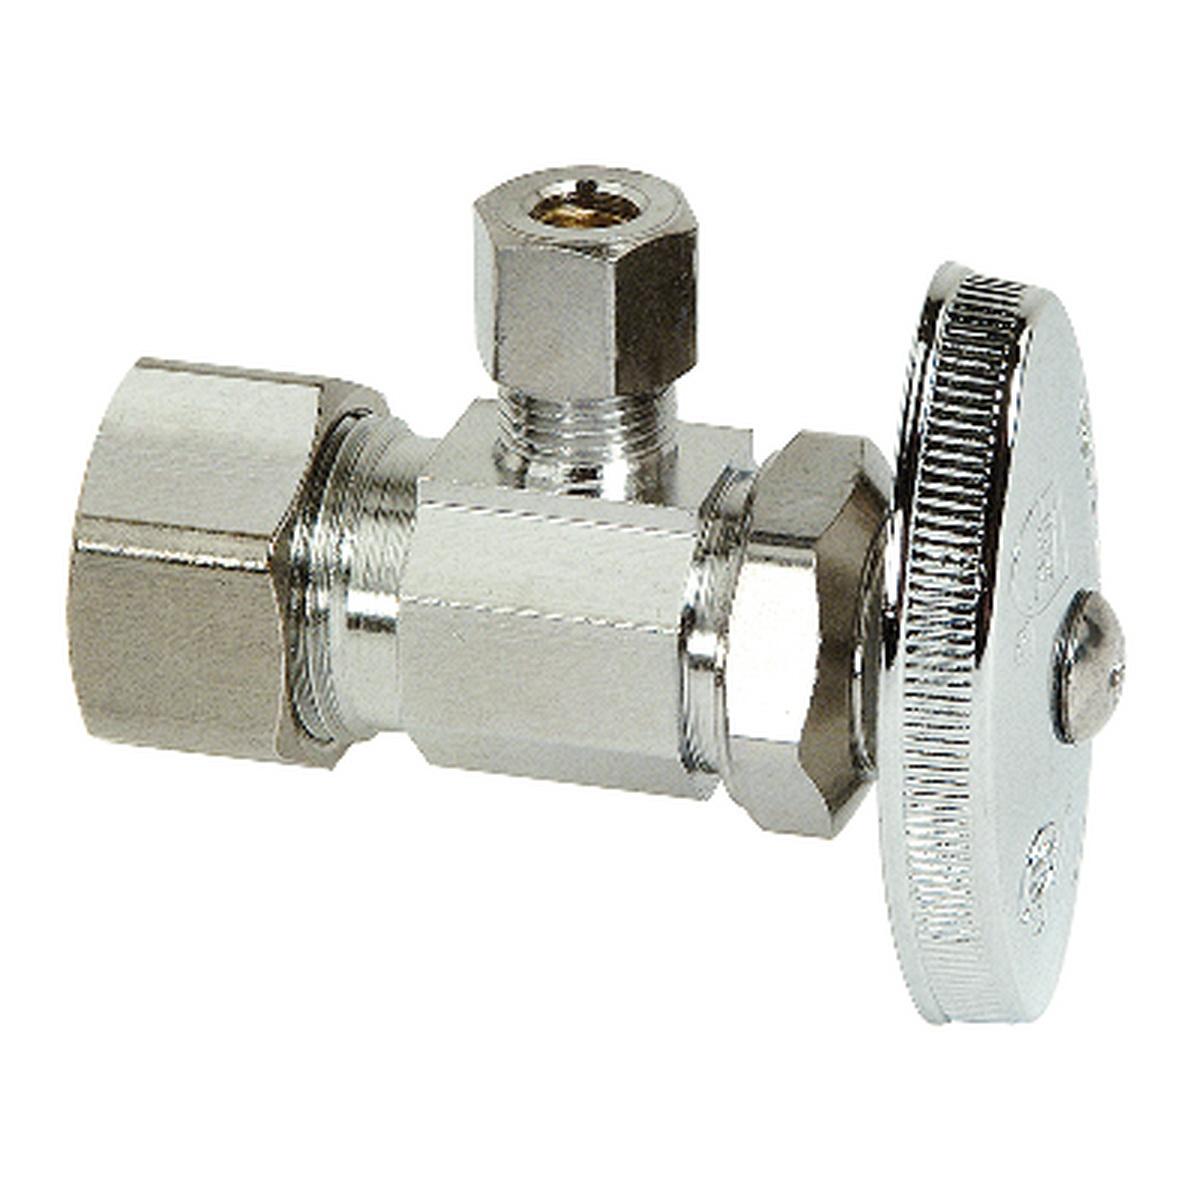 BrassCraft® OCR1BX Multi-Turn Lead Free Angle Stop, 1/2 x 1/4 in, Compression, 125 psi, Brass, Domestic